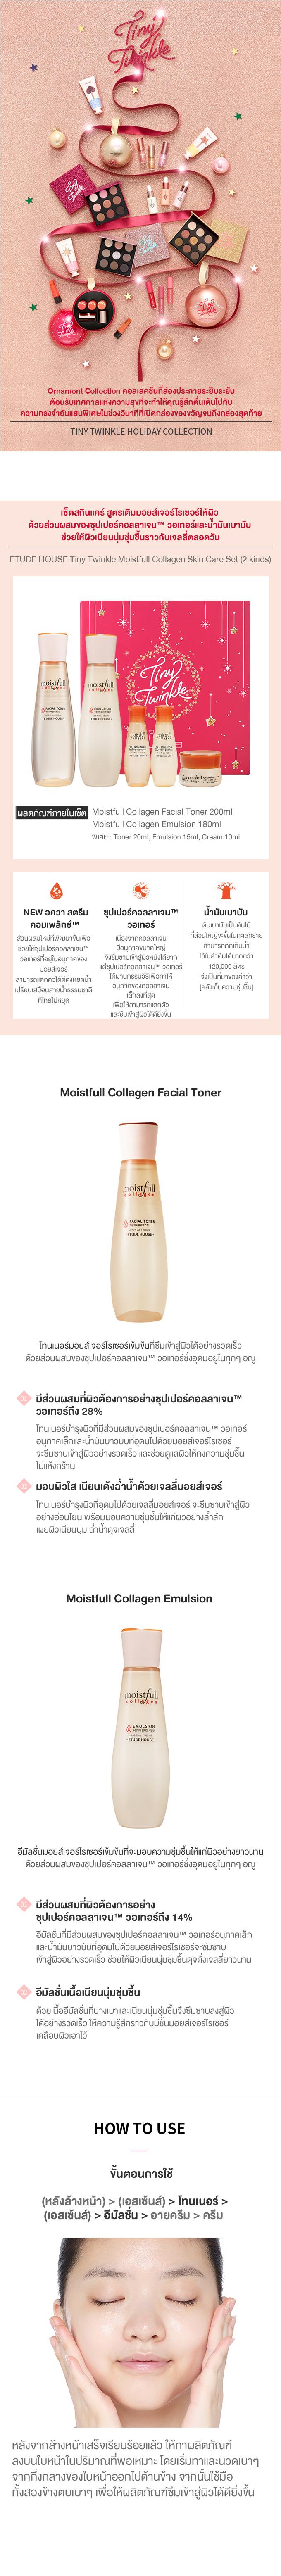 TH1_(TW)Moistful Collagen Skin Care Set